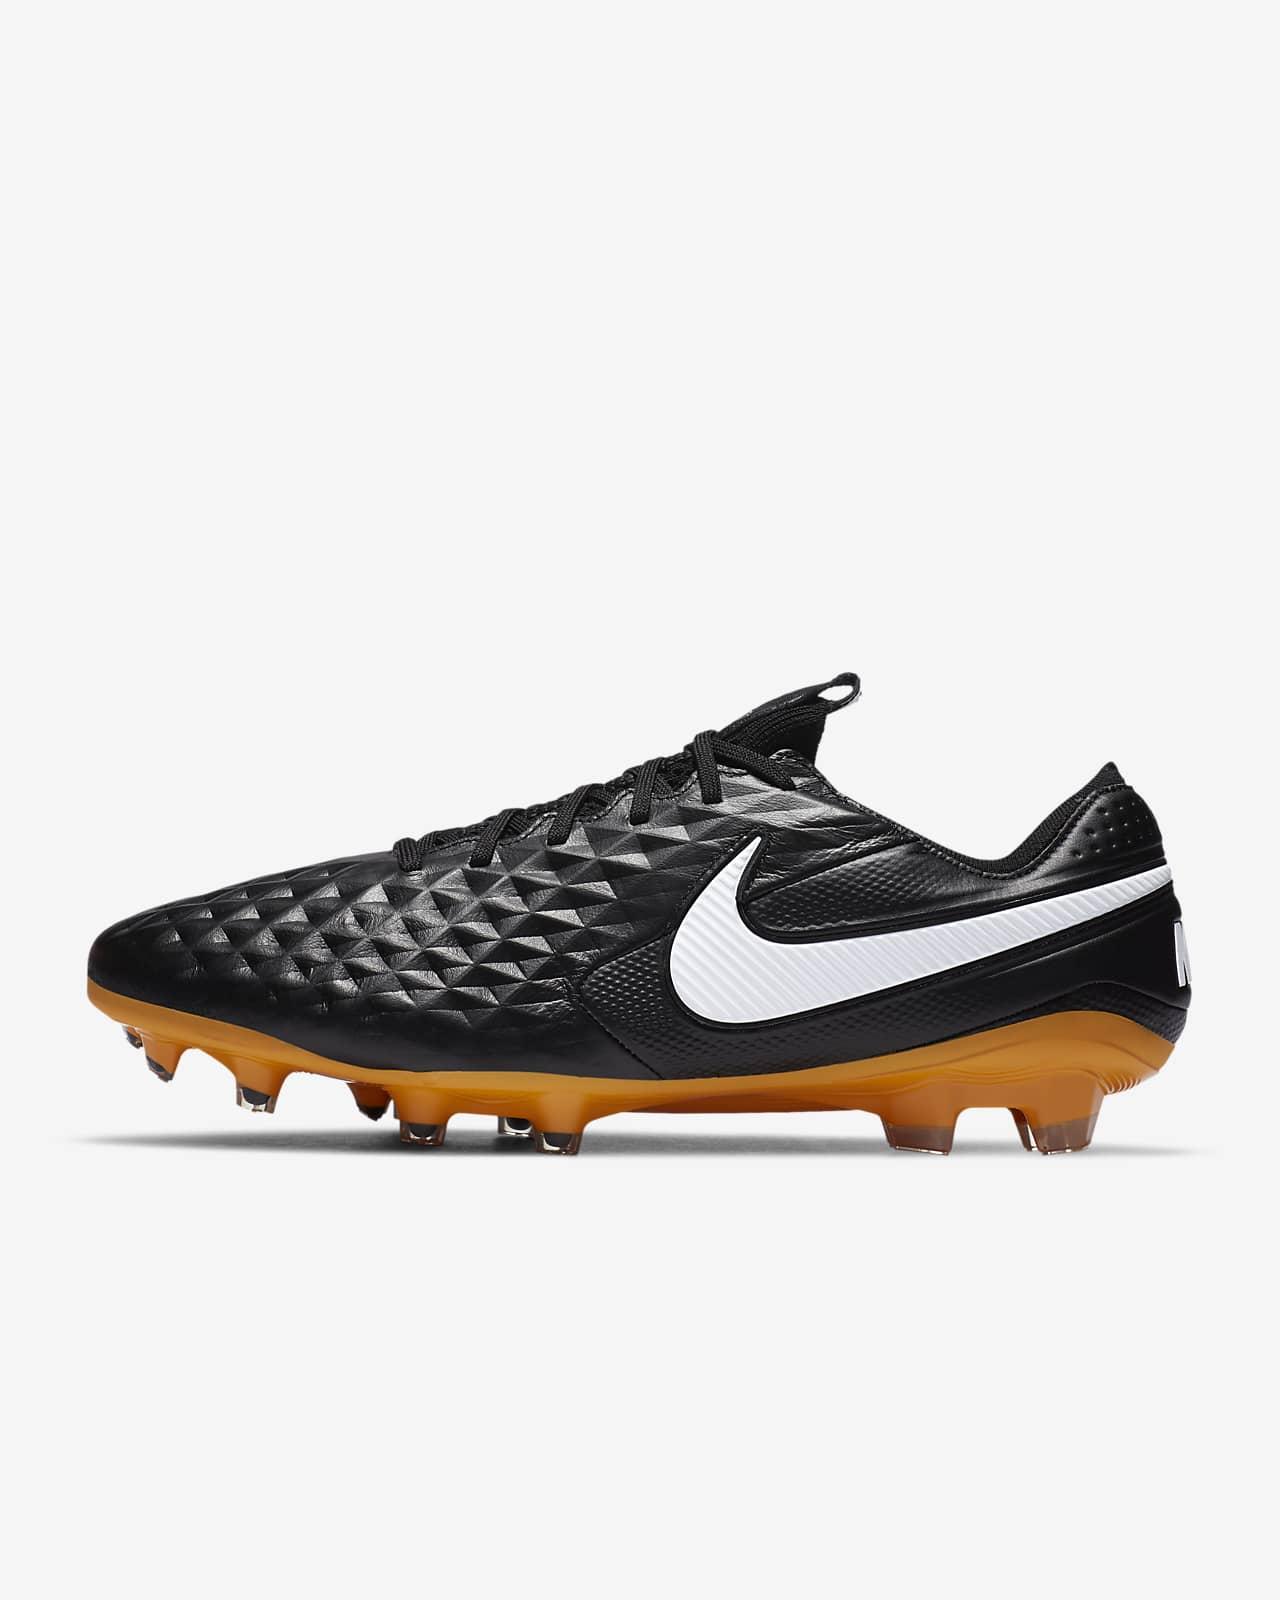 Nike Tiempo Legend 8 Elite Tech Craft FG Firm-Ground Football Boot